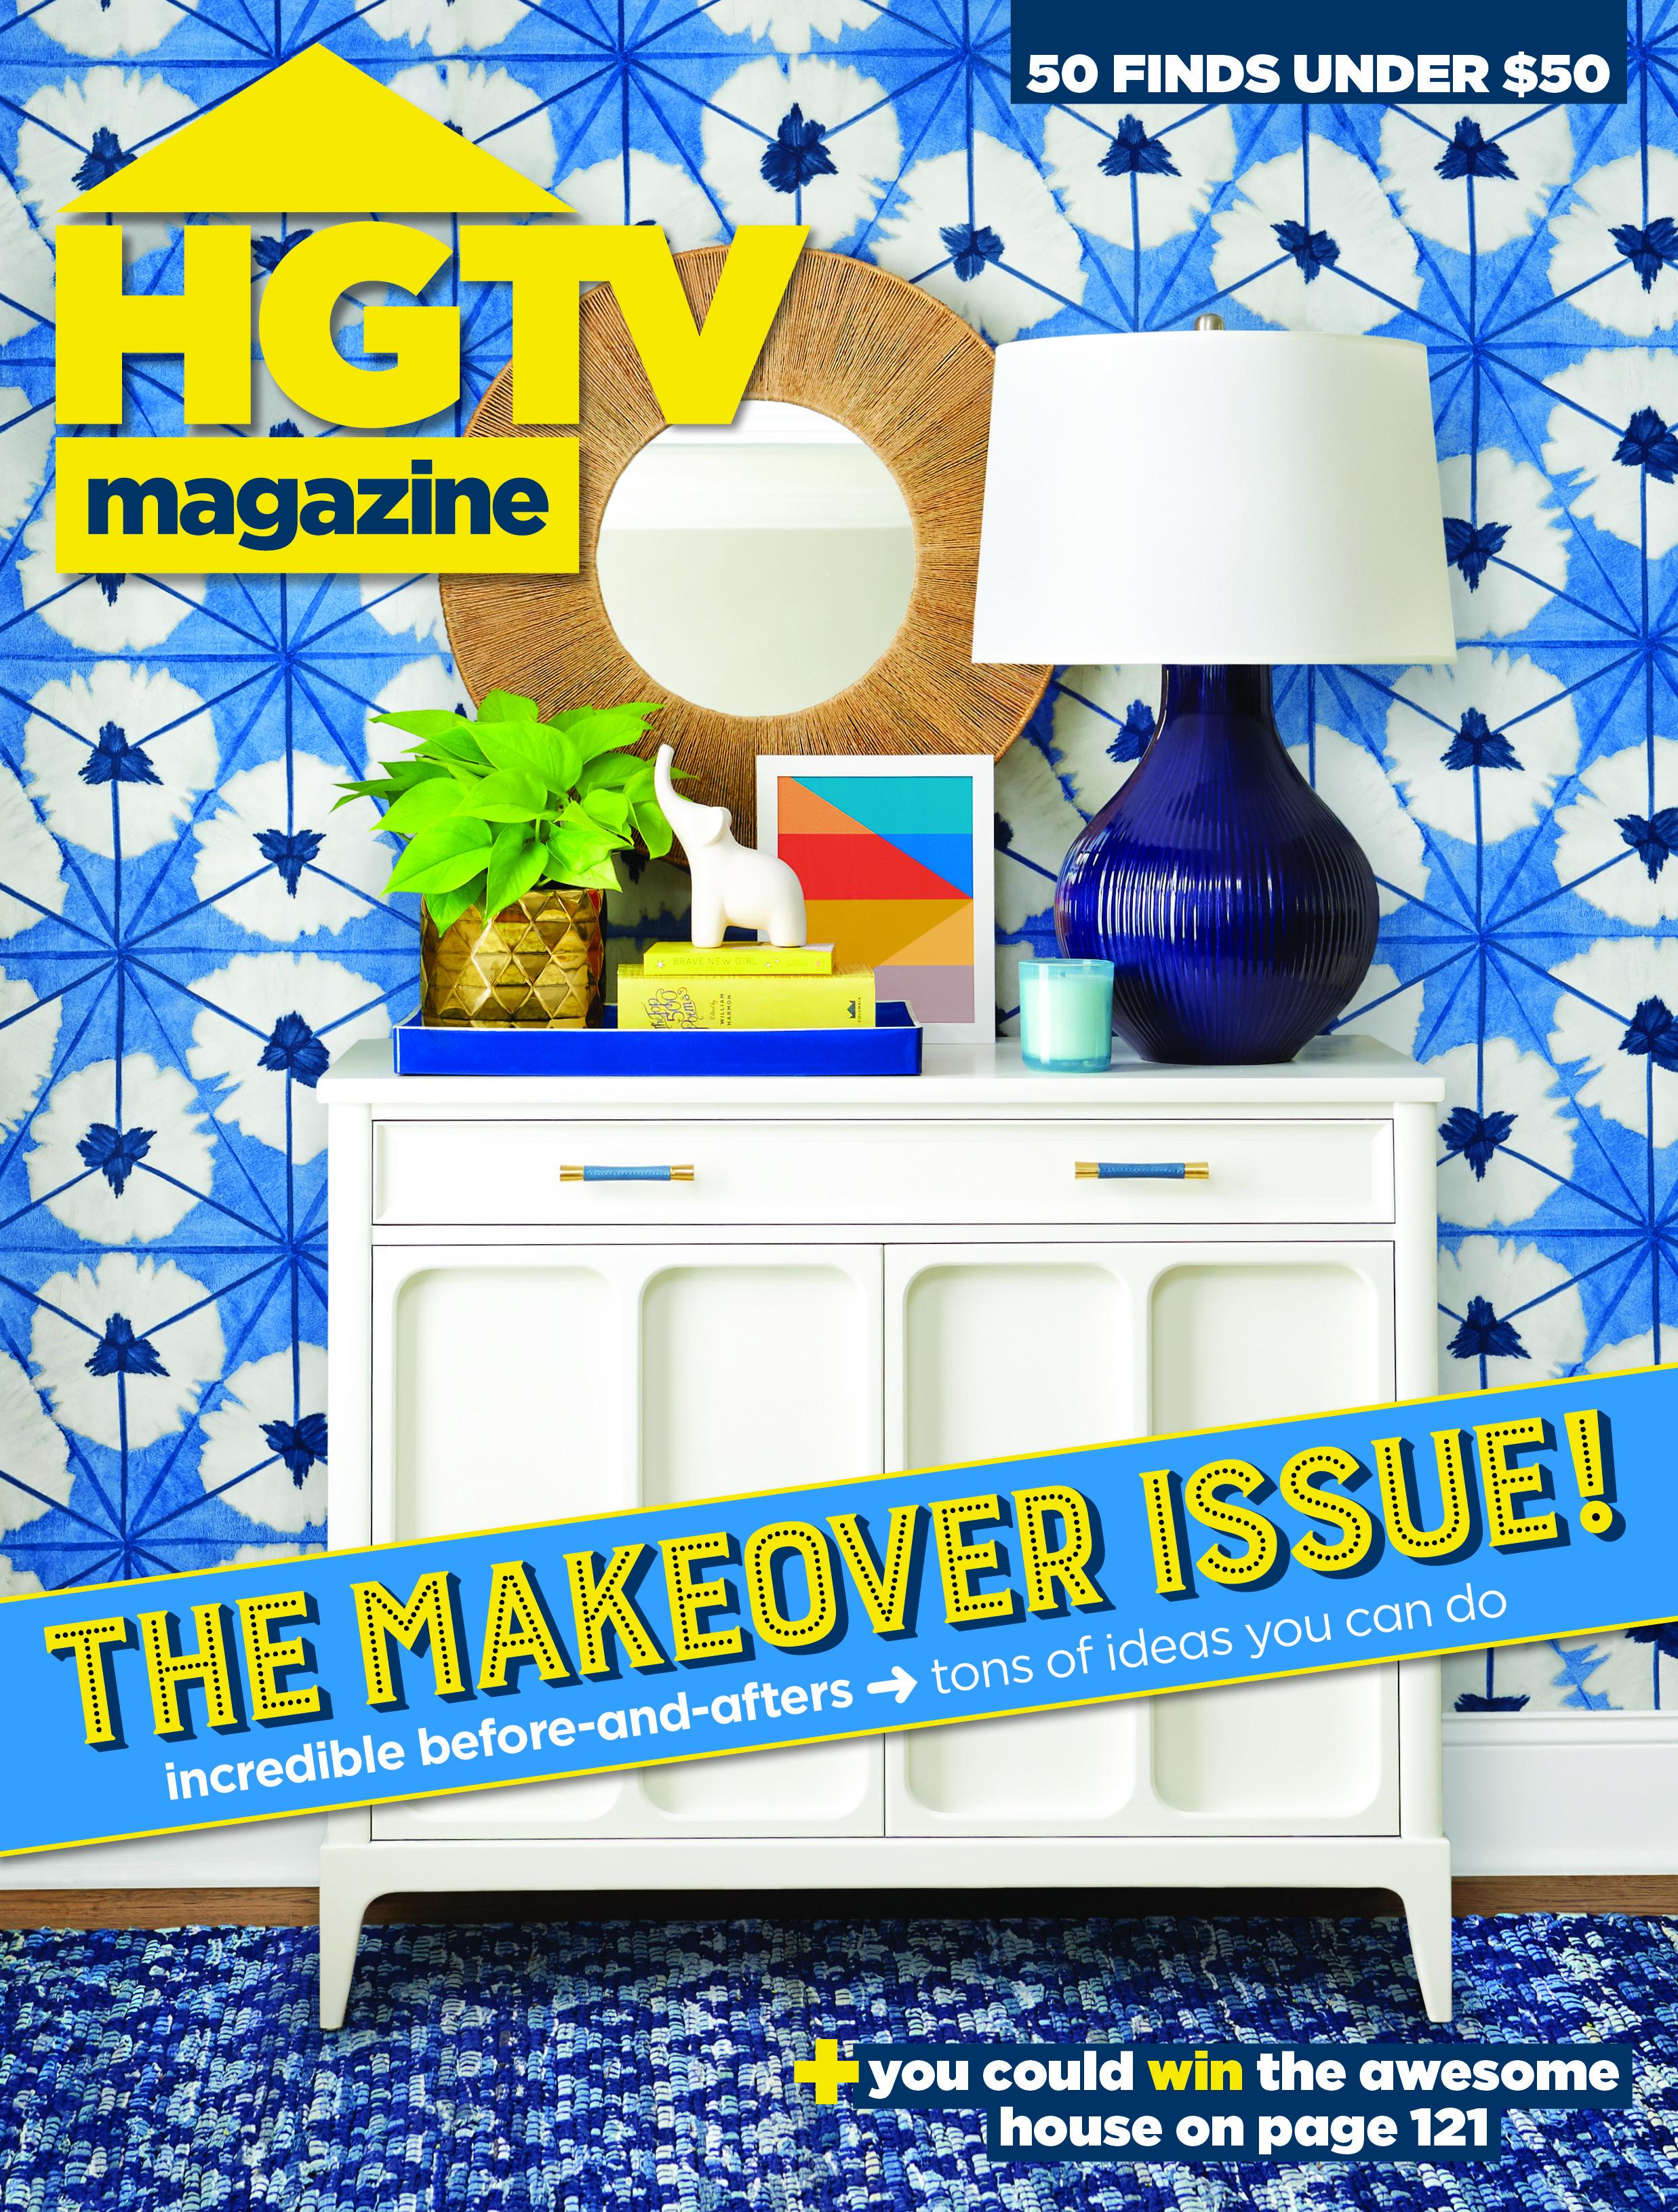 HGV090118cover-300dpi.jpg